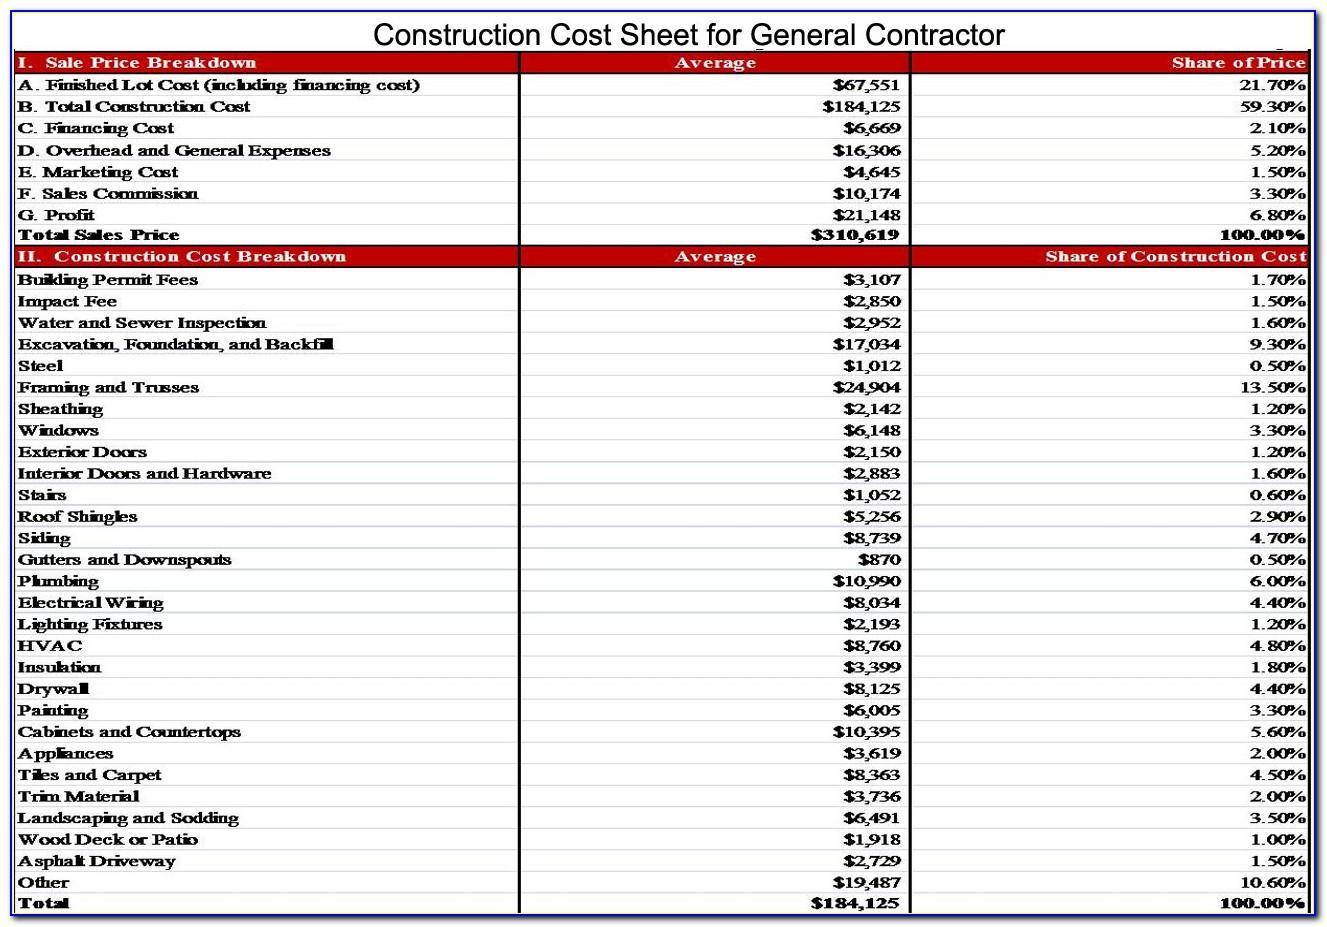 Construction Cost Breakdown Spreadsheet Excel